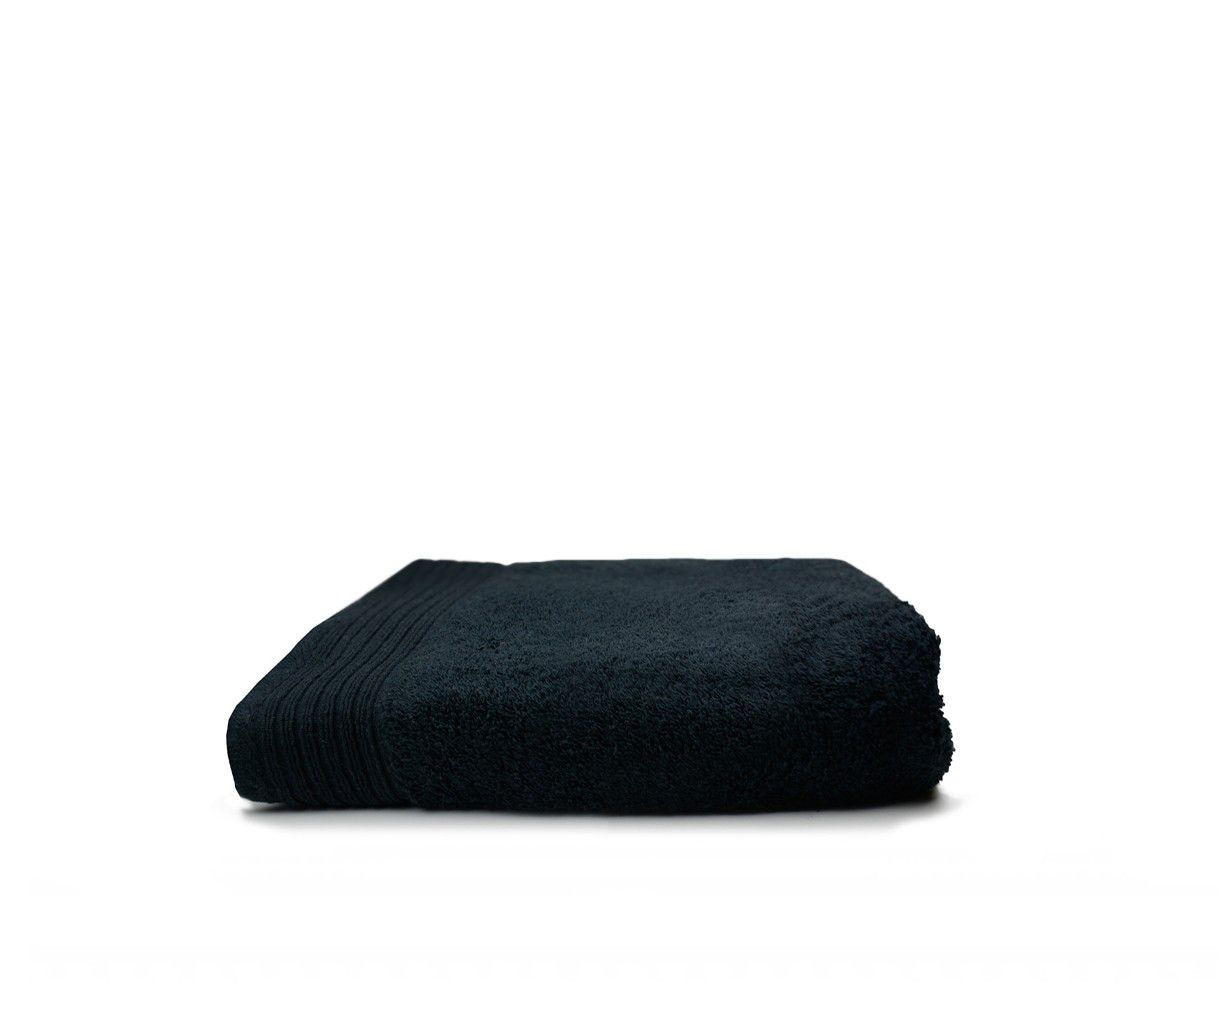 The One Handdoek 450 gram 50x100 cm Zwart